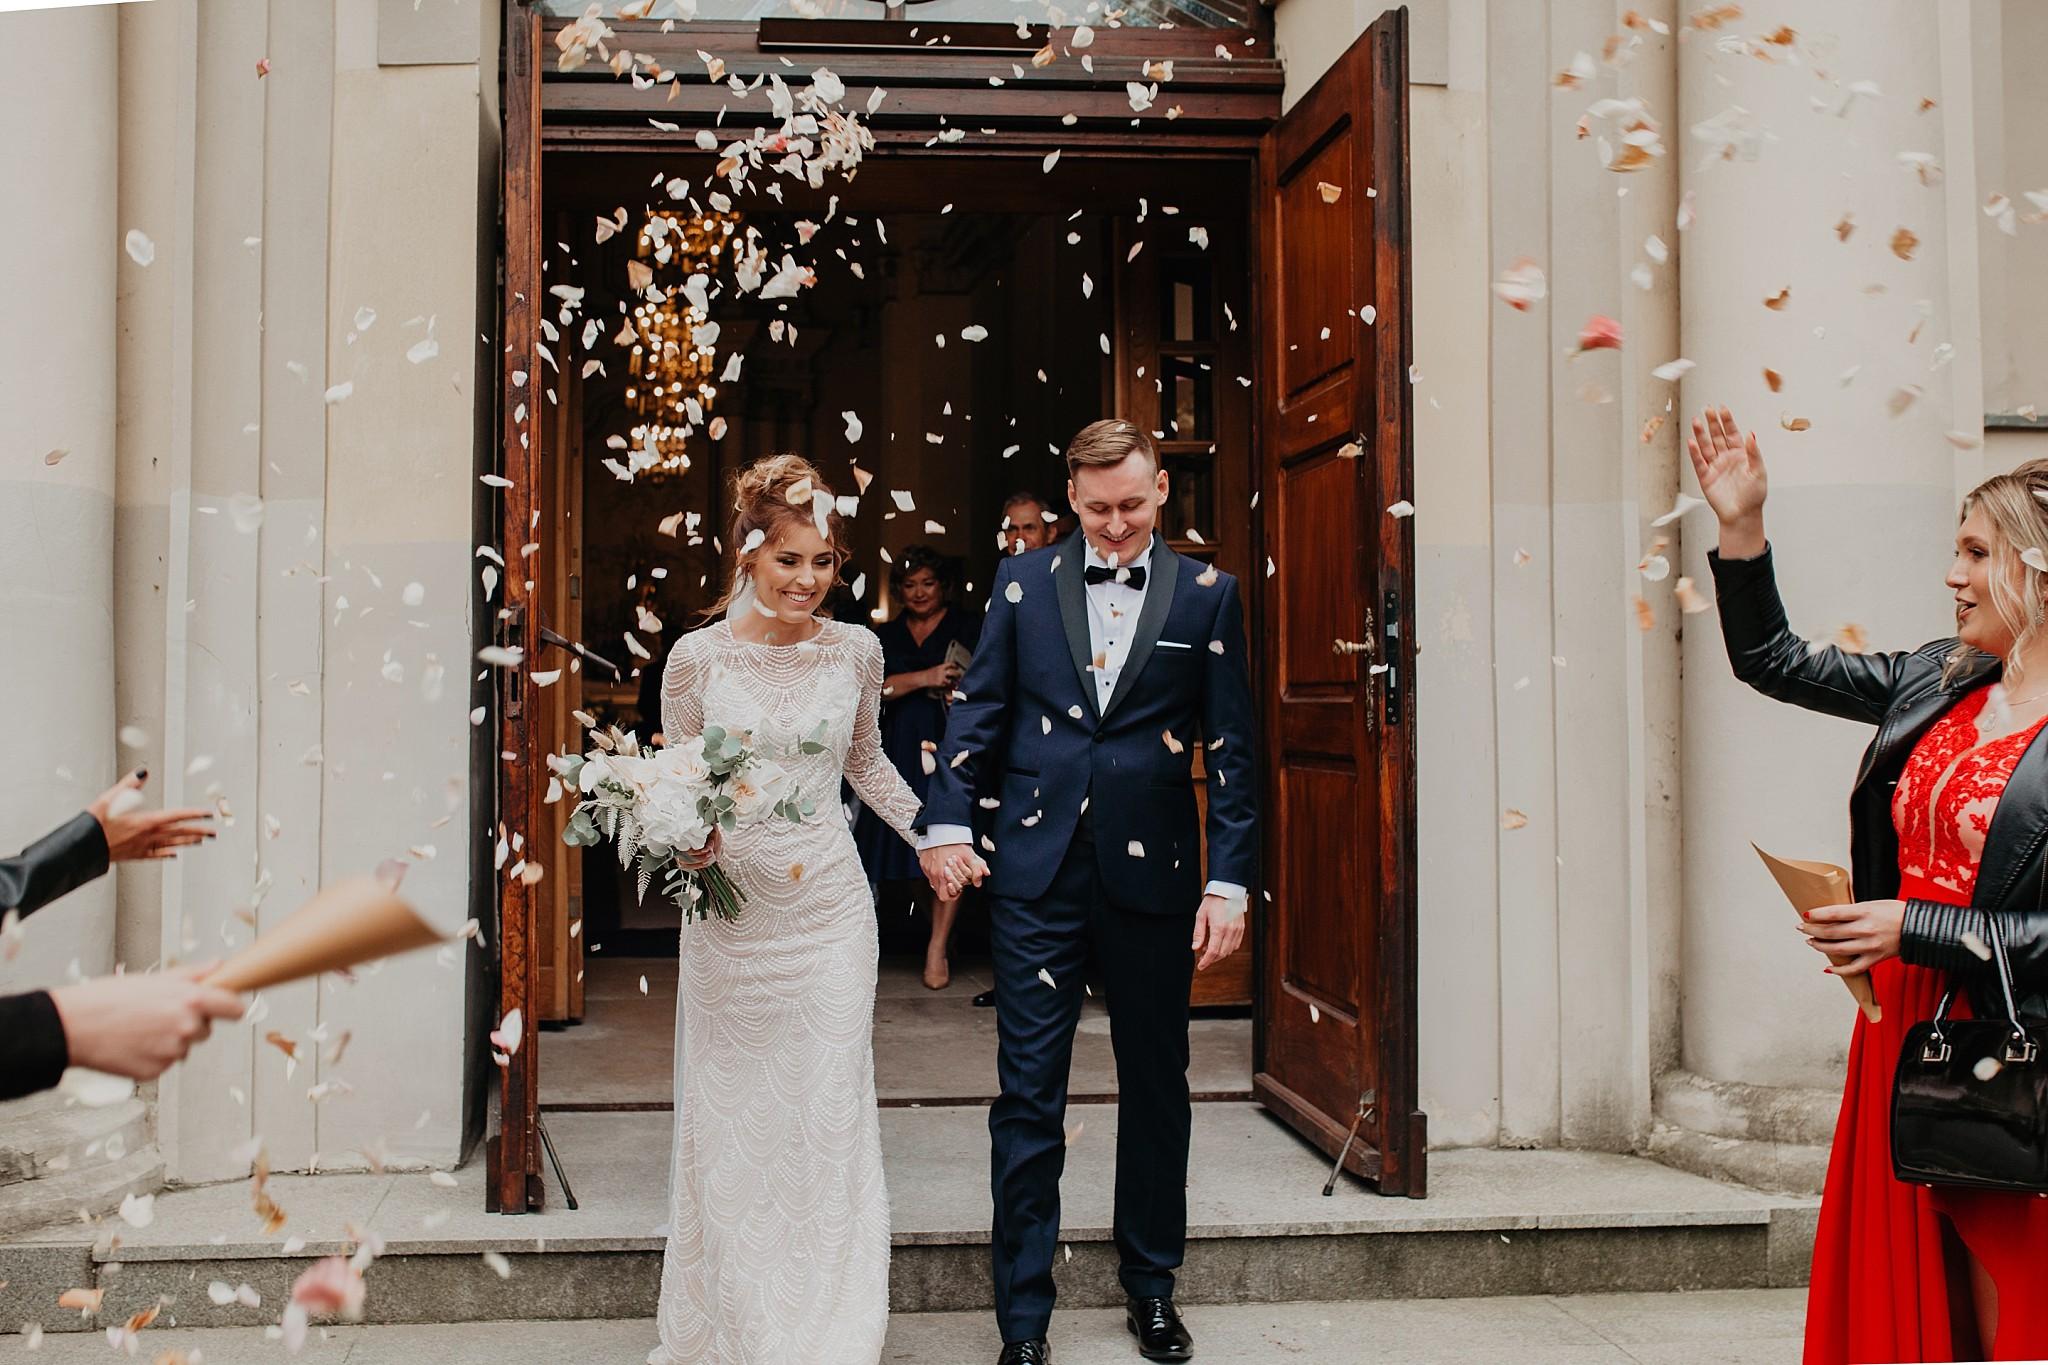 fotograf poznan wesele dobra truskawka piekne wesele pod poznaniem wesele w dobrej truskawce piekna para mloda slub marzen slub koronawirus slub listopad wesele koronawirus 217